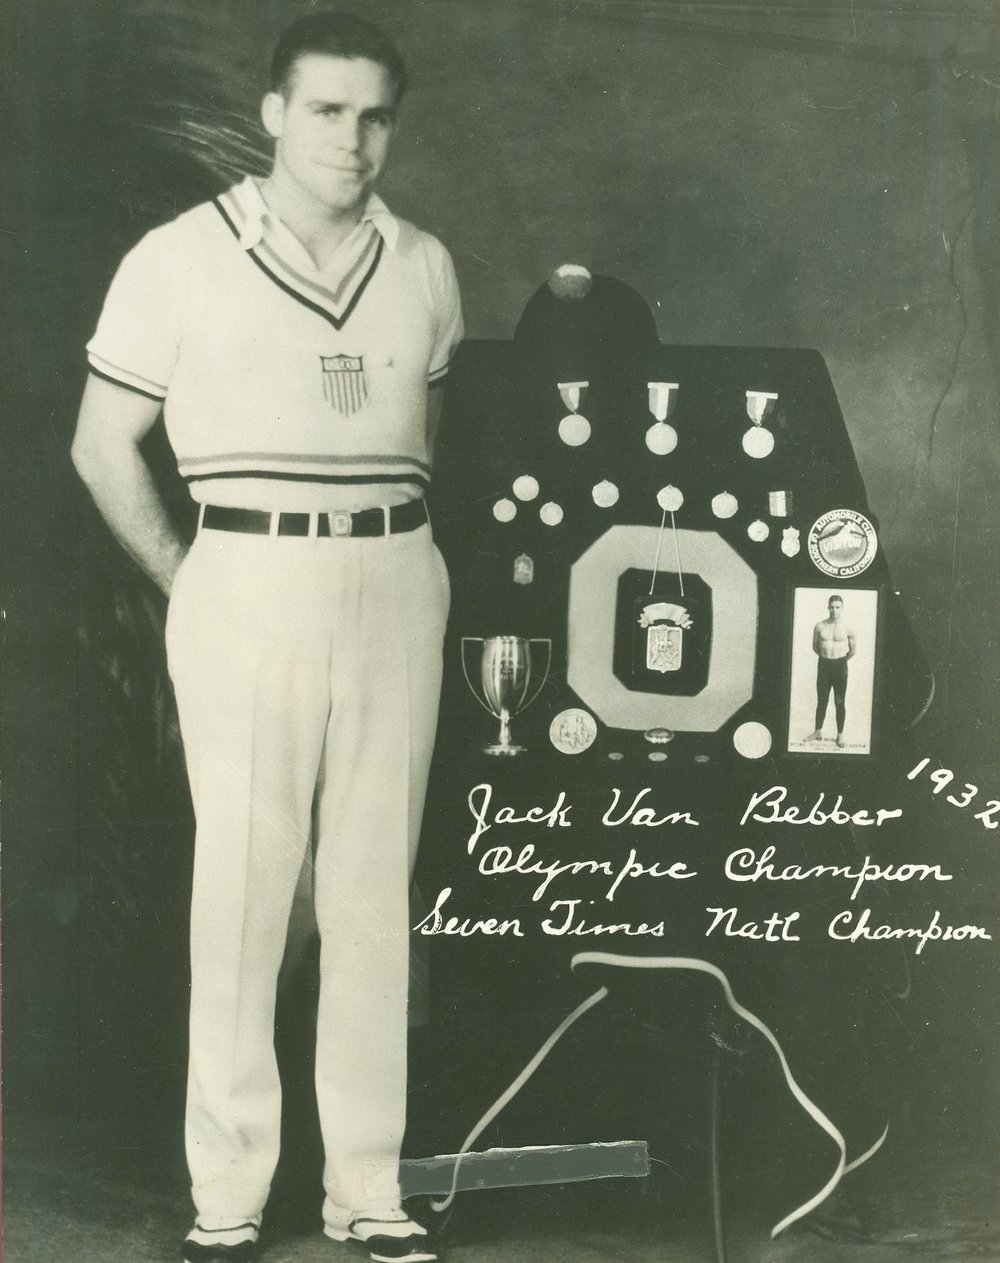 Jack VanBebber 1932 Olympic Champion